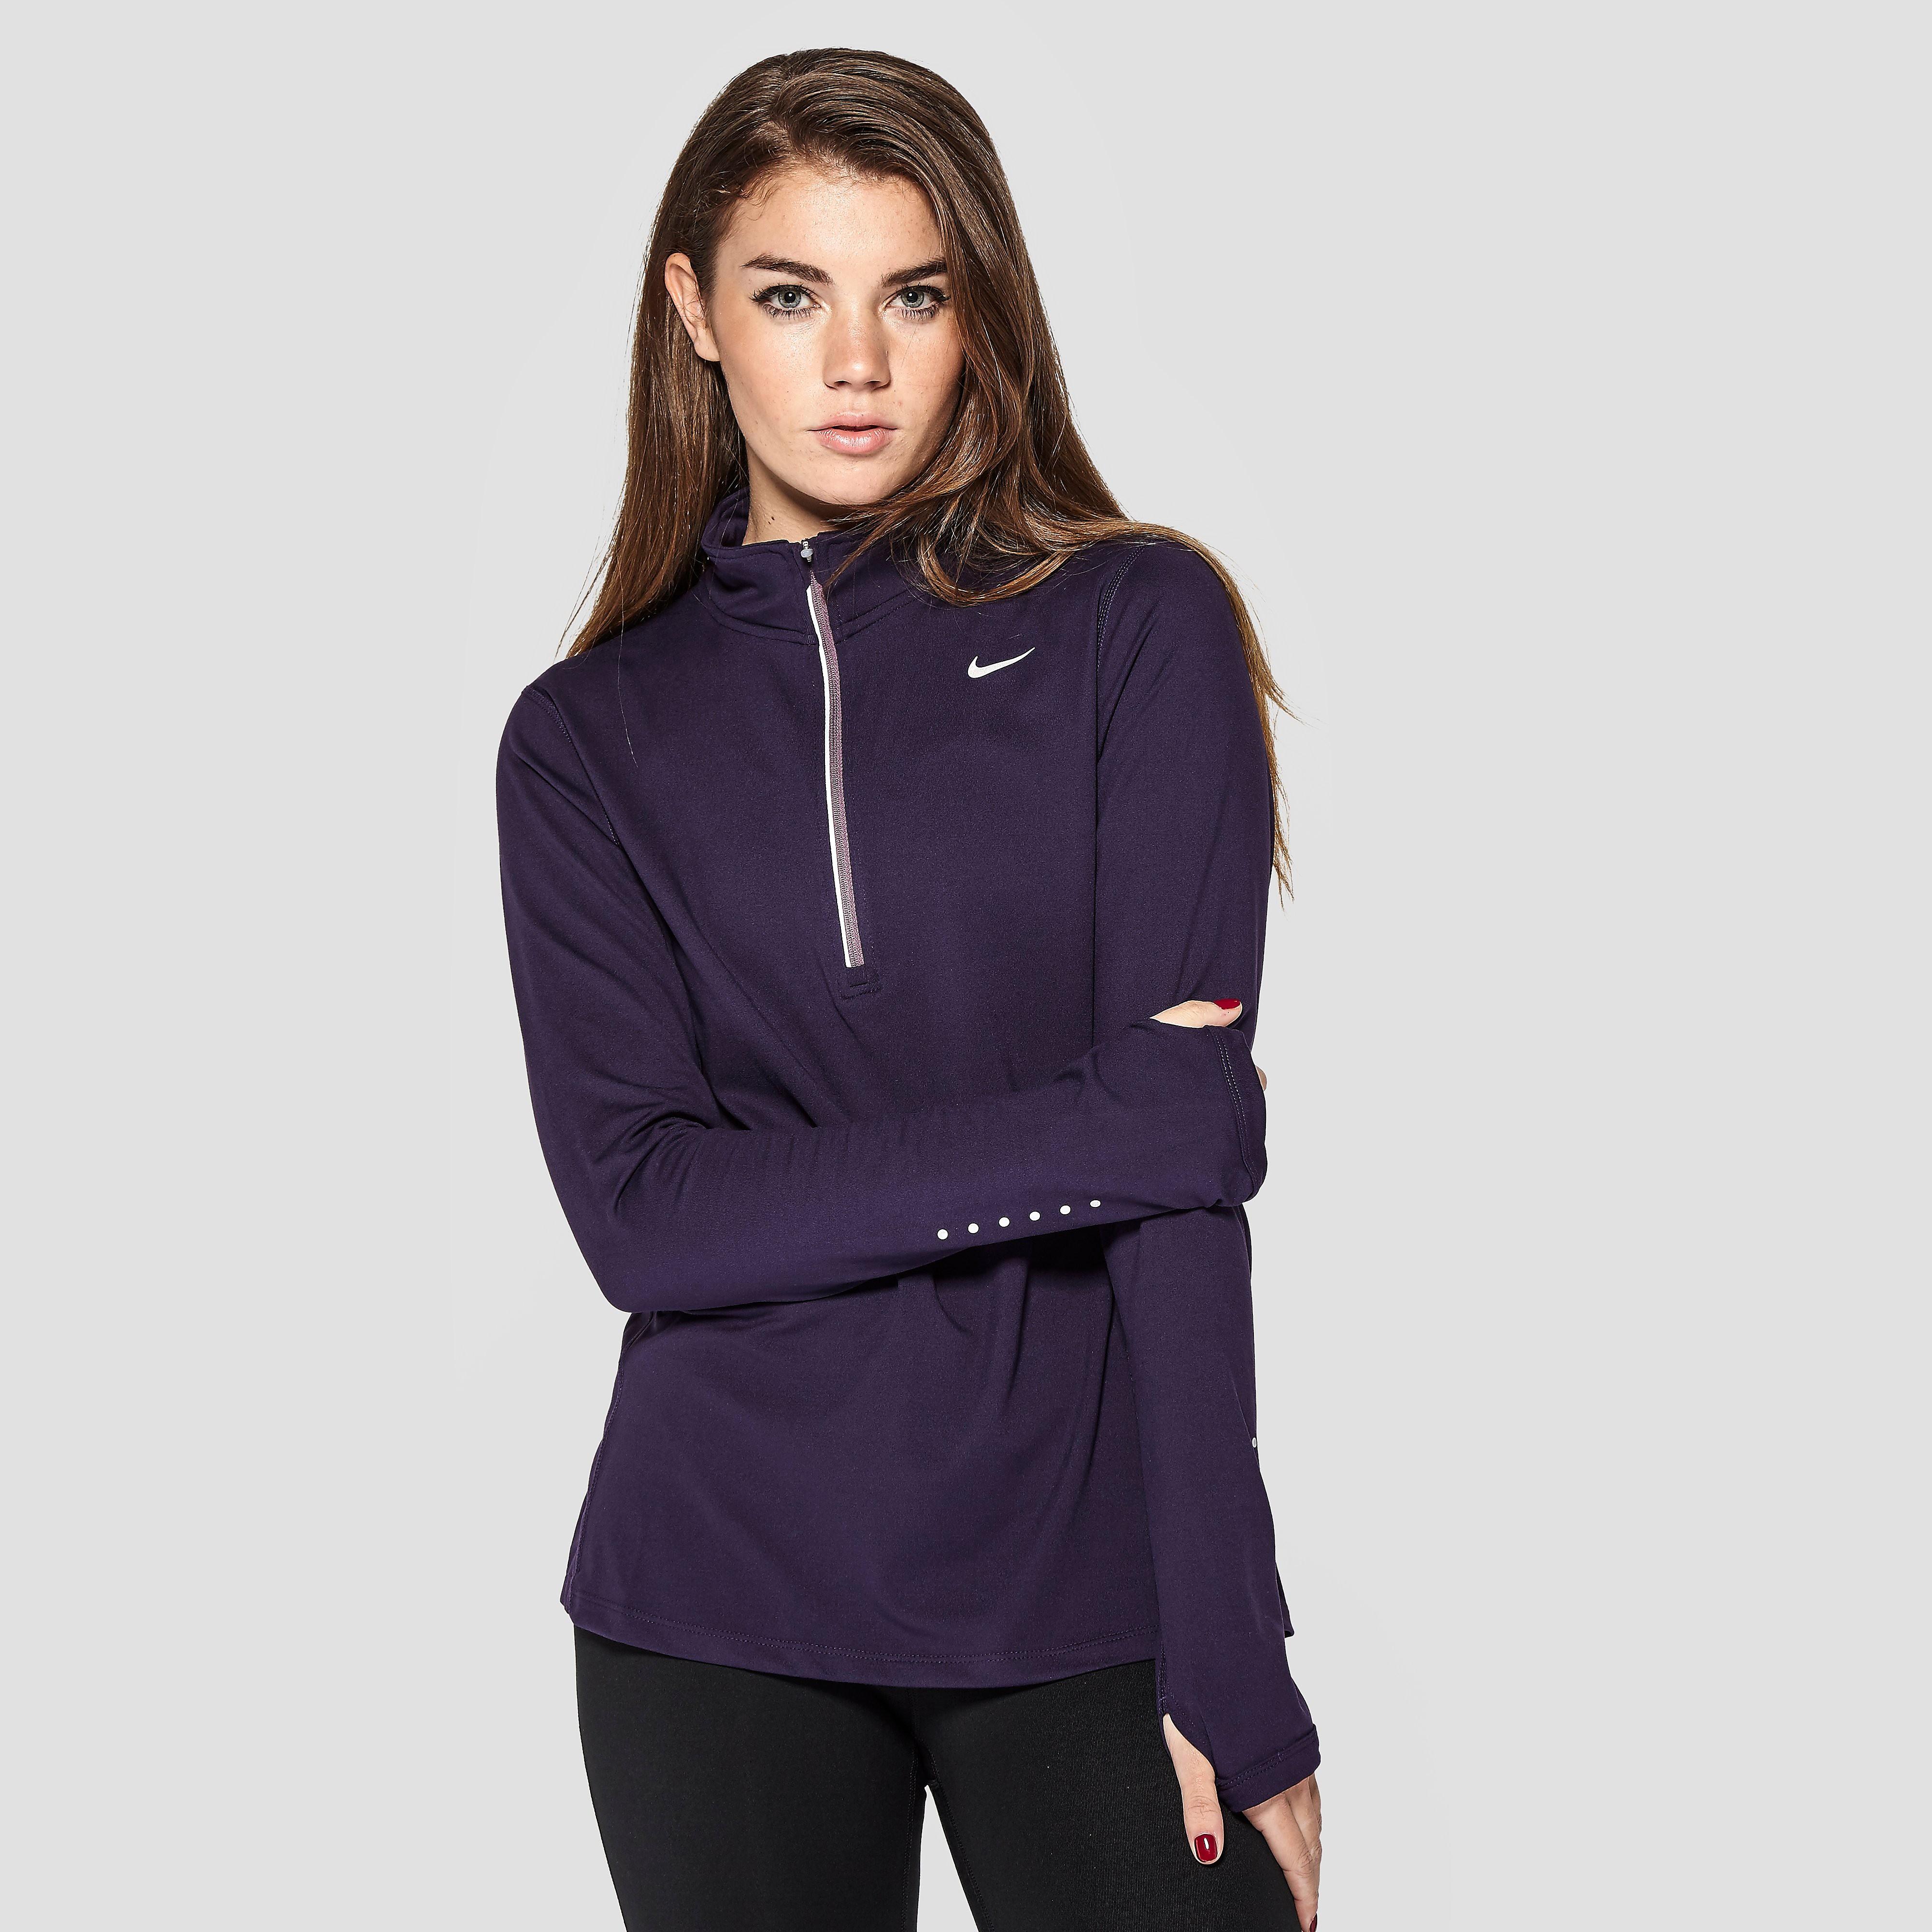 Nike Women's Dry element Long-Sleeve Running Top